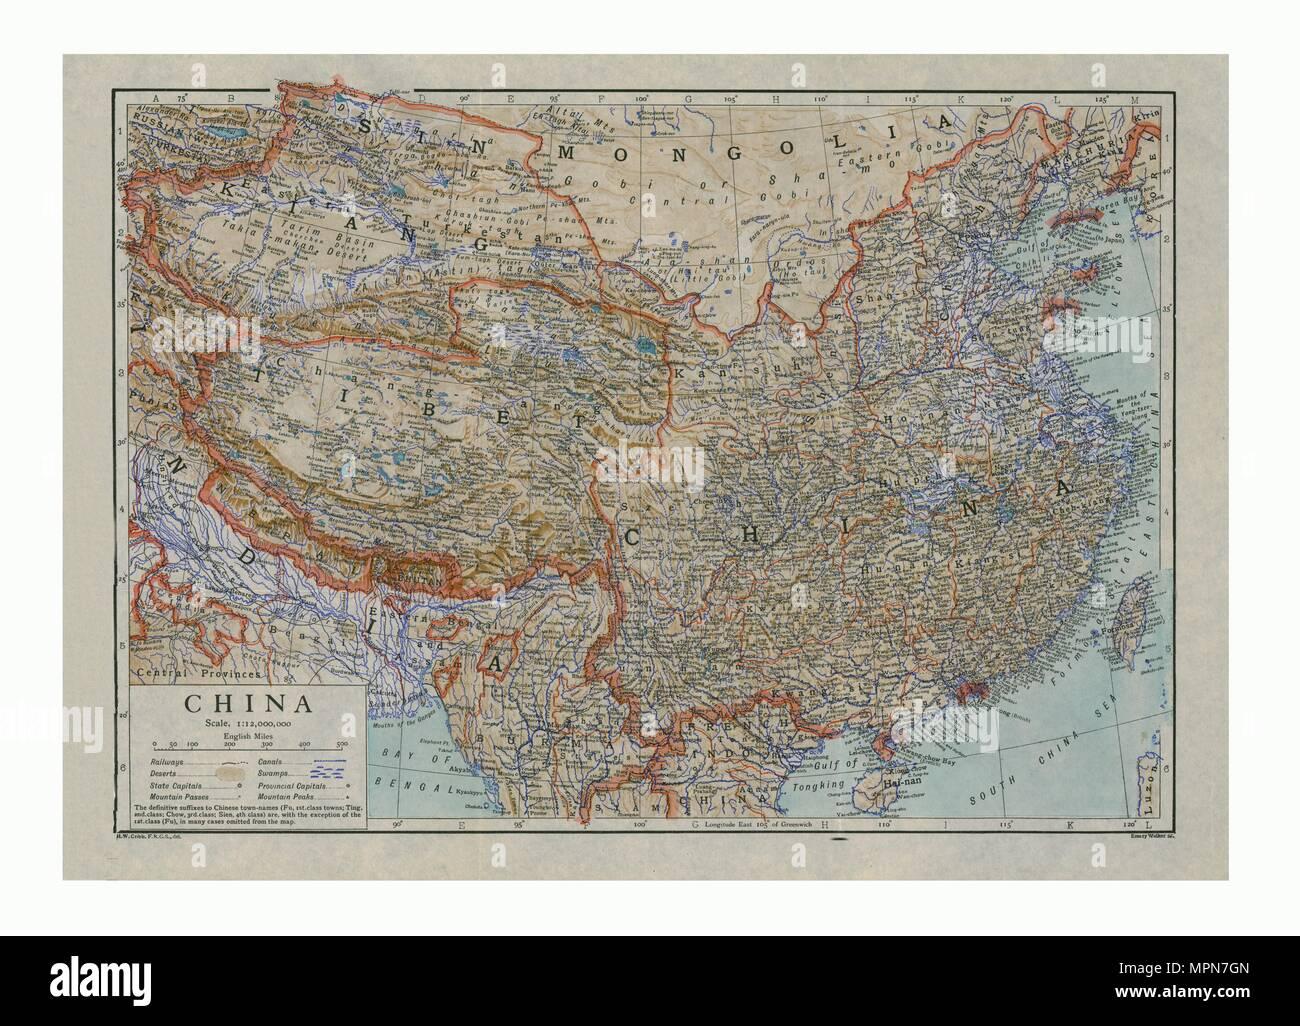 Map of China, c1910. Artists: HW Cribb, Emery Walker Ltd. - Stock Image